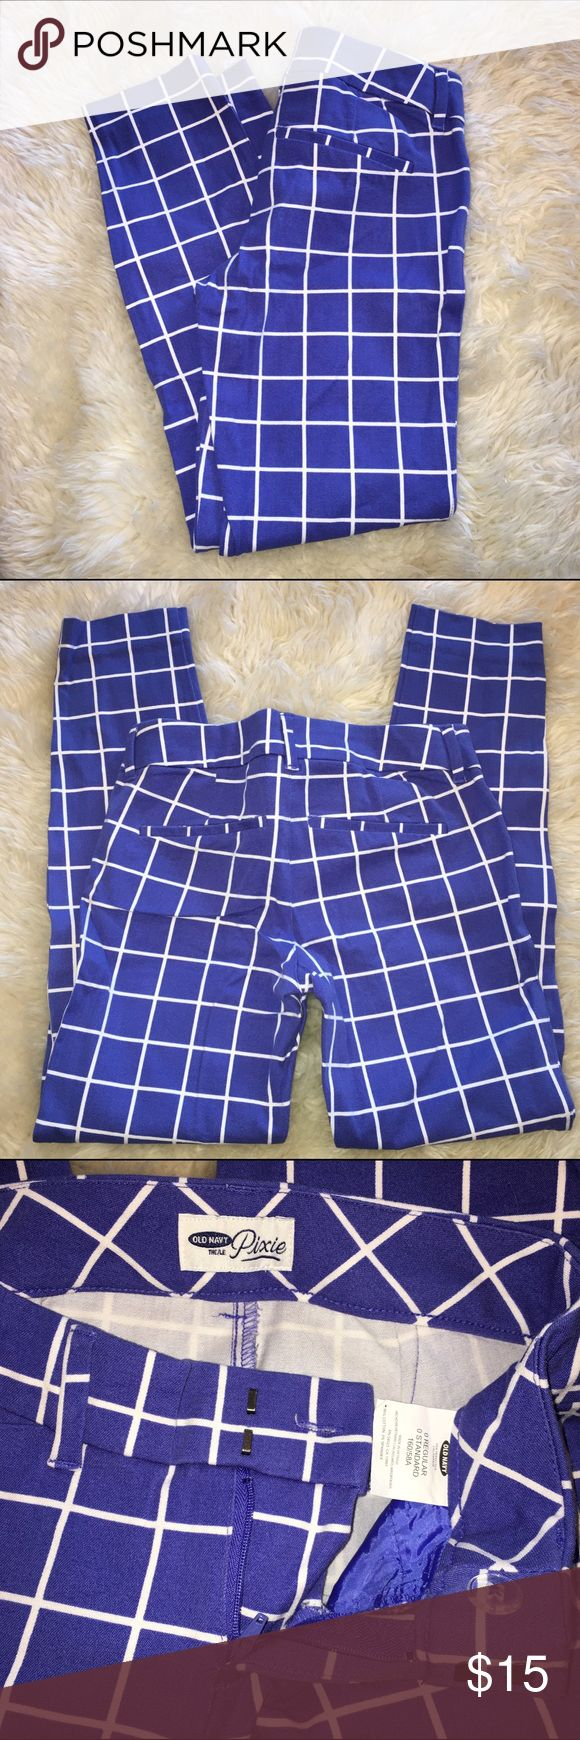 Old Navy Pixie Pants Old navy pixie pants. Kind of a blue/ purple color. Super comfy, tight fit. Old Navy Pants